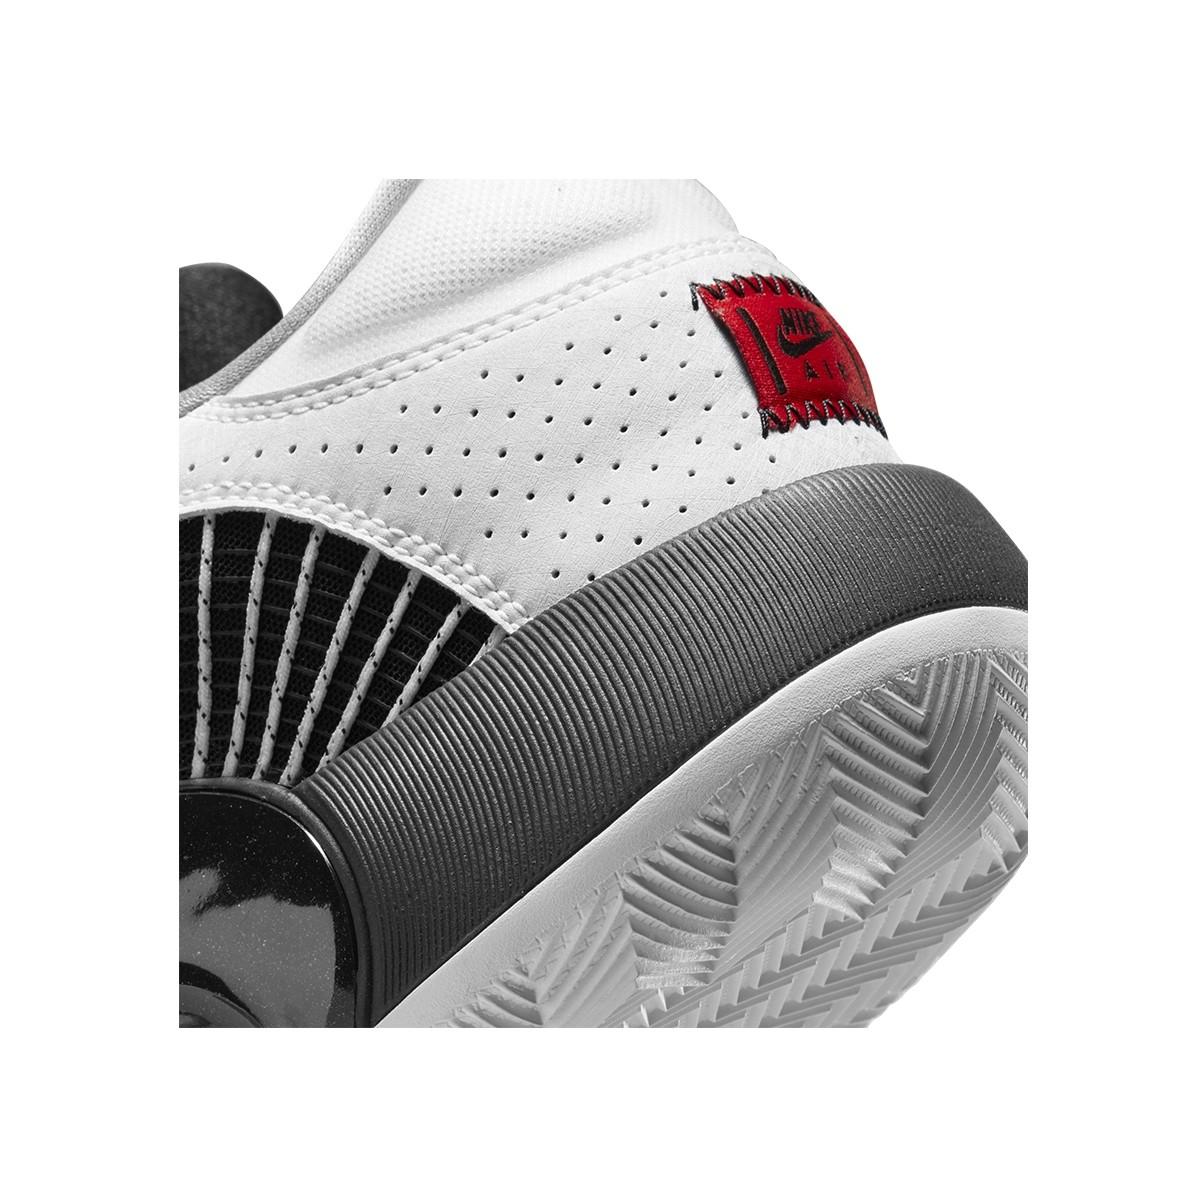 Air Jordan 35 Low 'Black & White'-CW2460-101